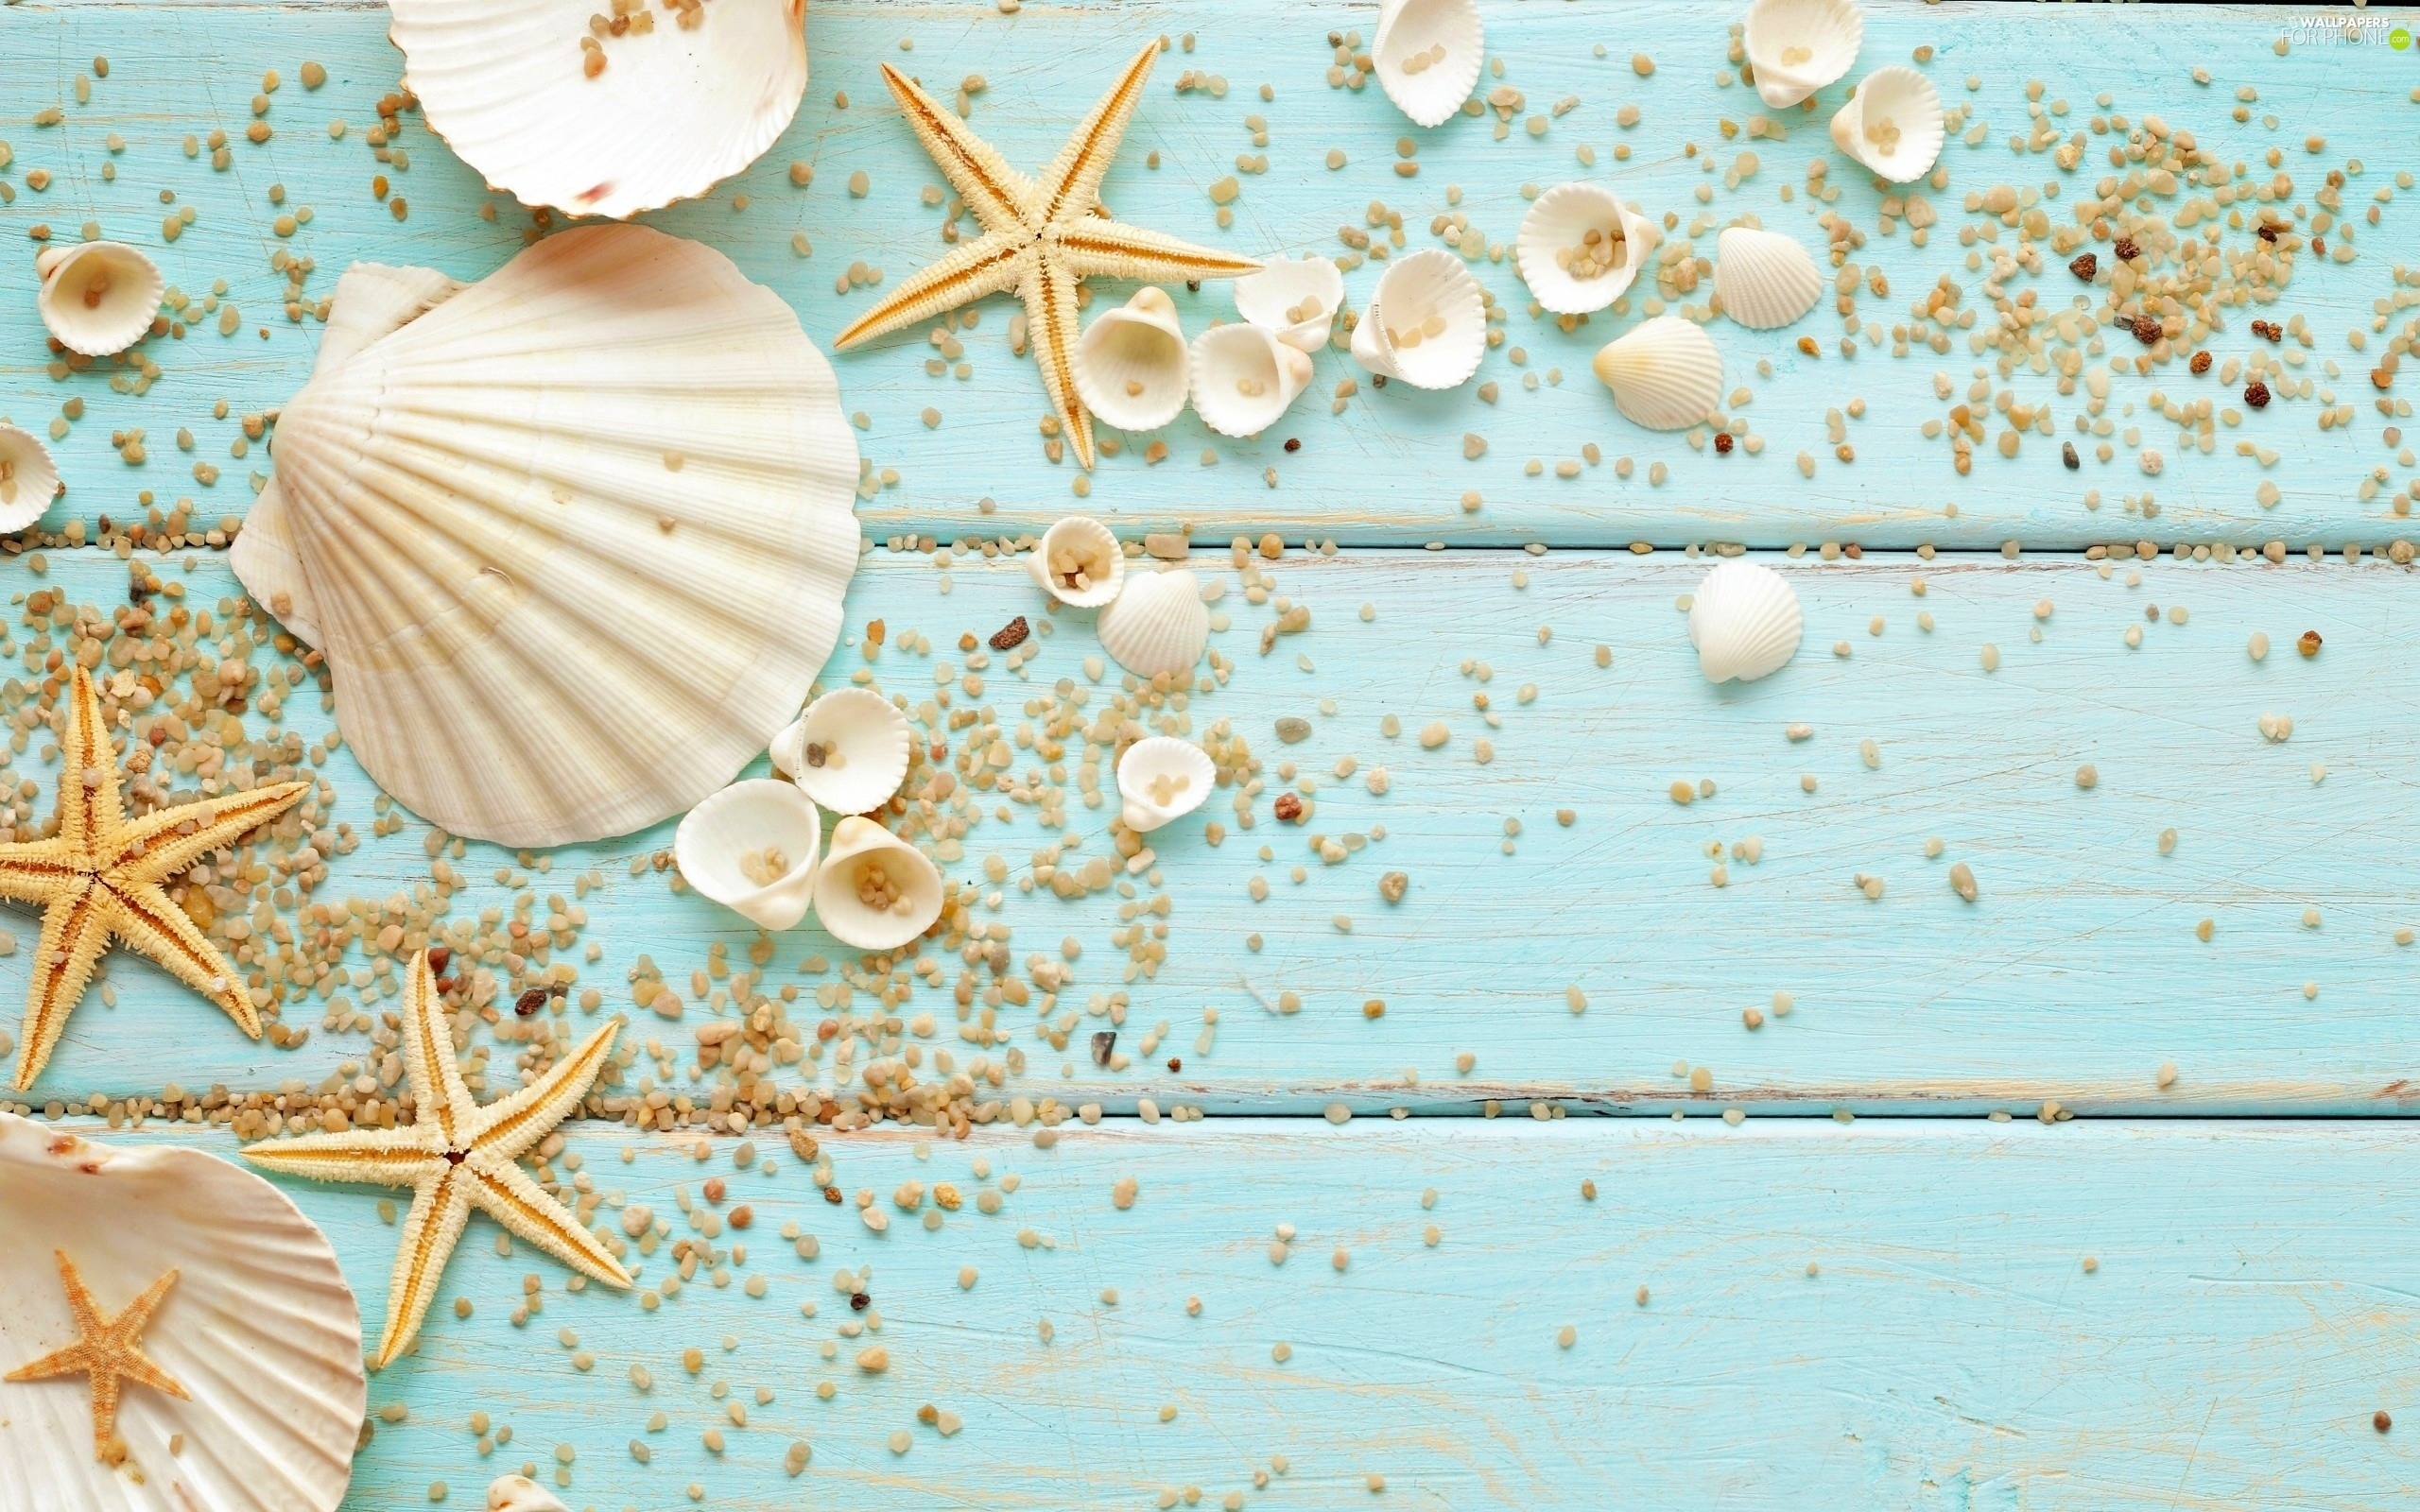 decoration  shells  starfish  pebbles